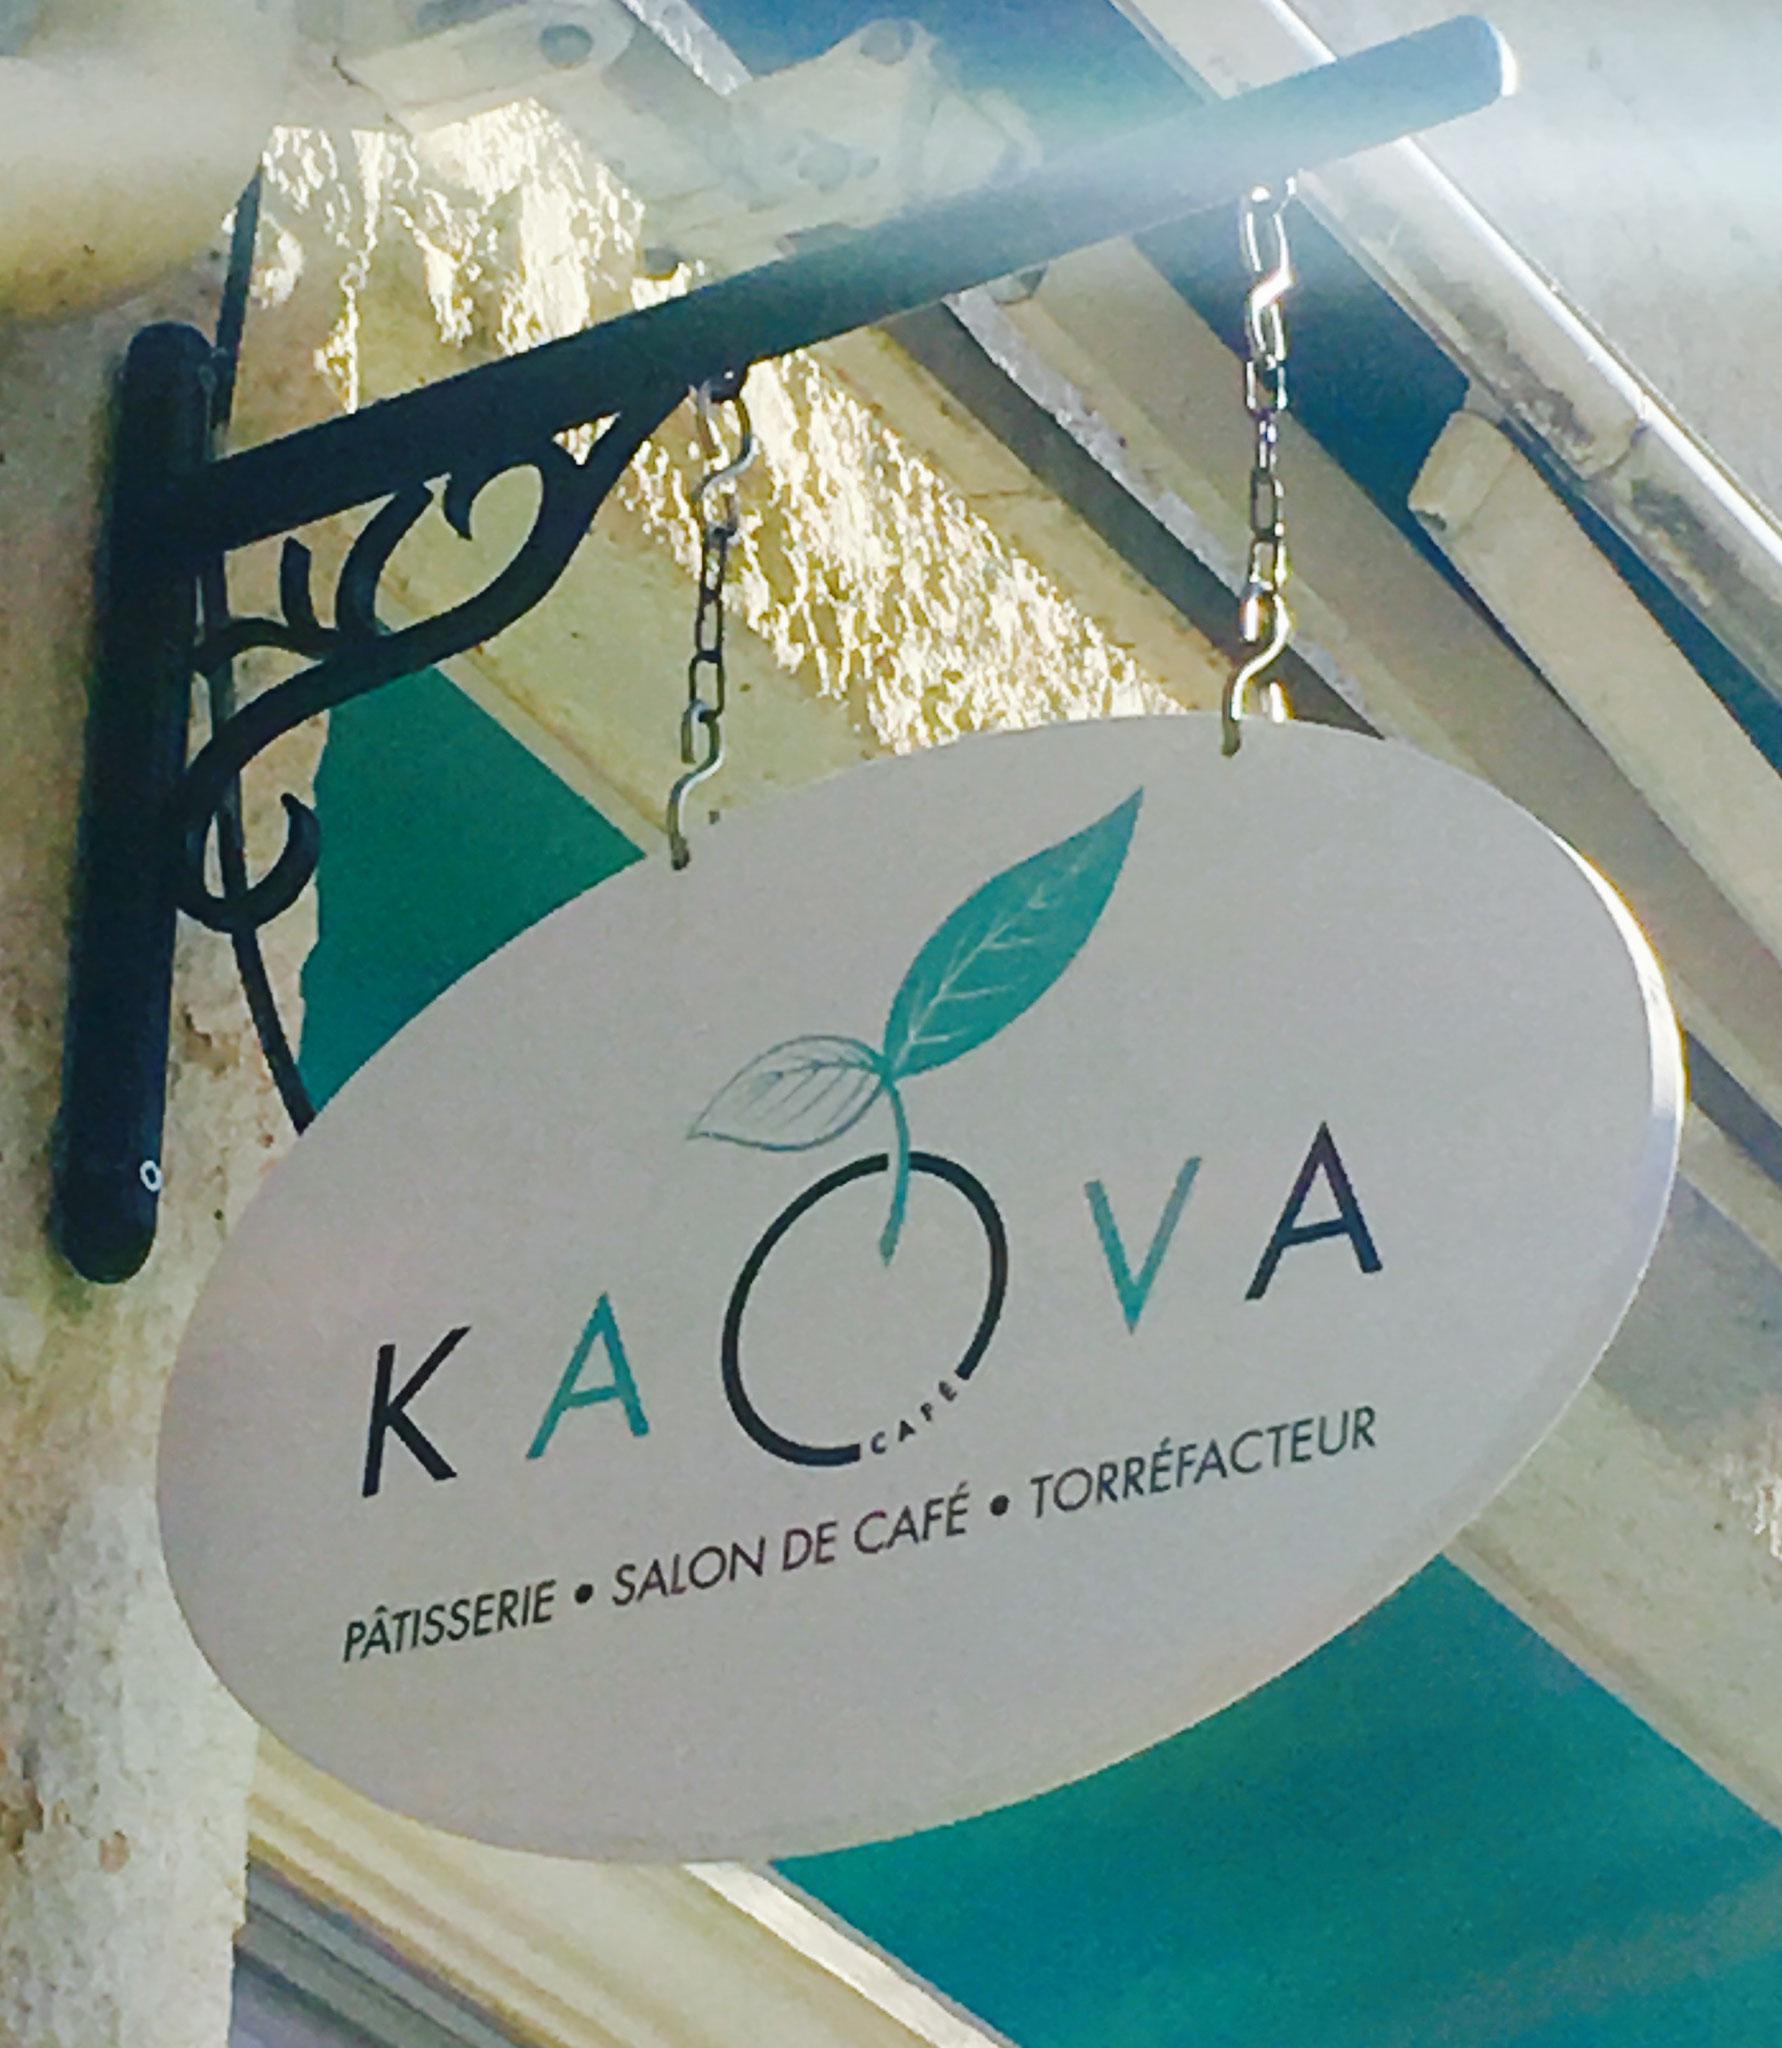 KAOVA CAFE